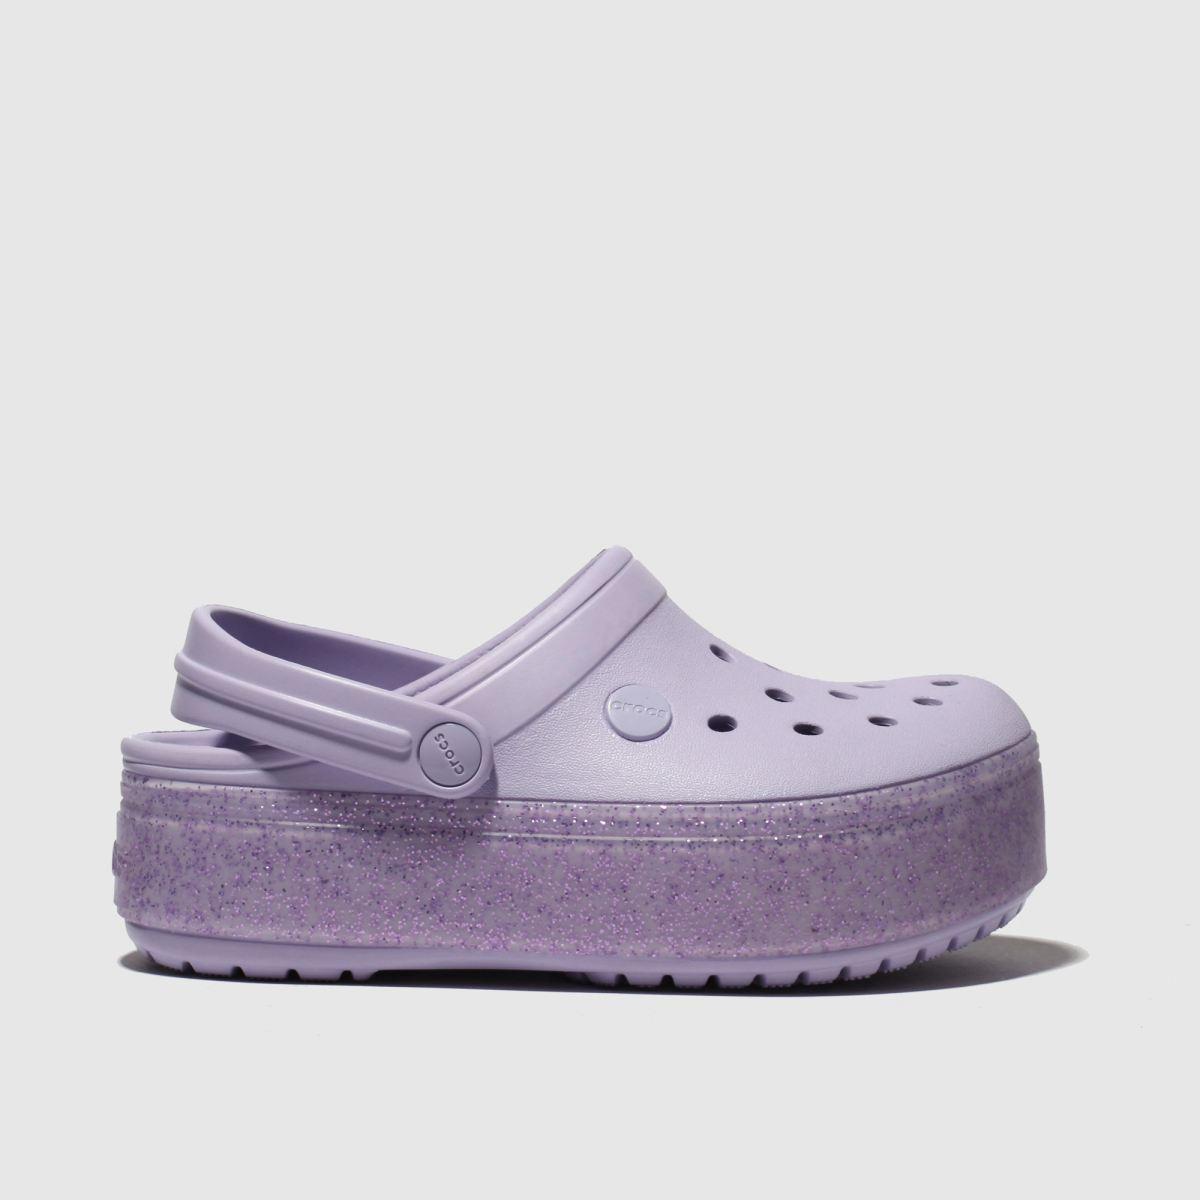 Crocs Lilac Crocband Platform Sandals Junior